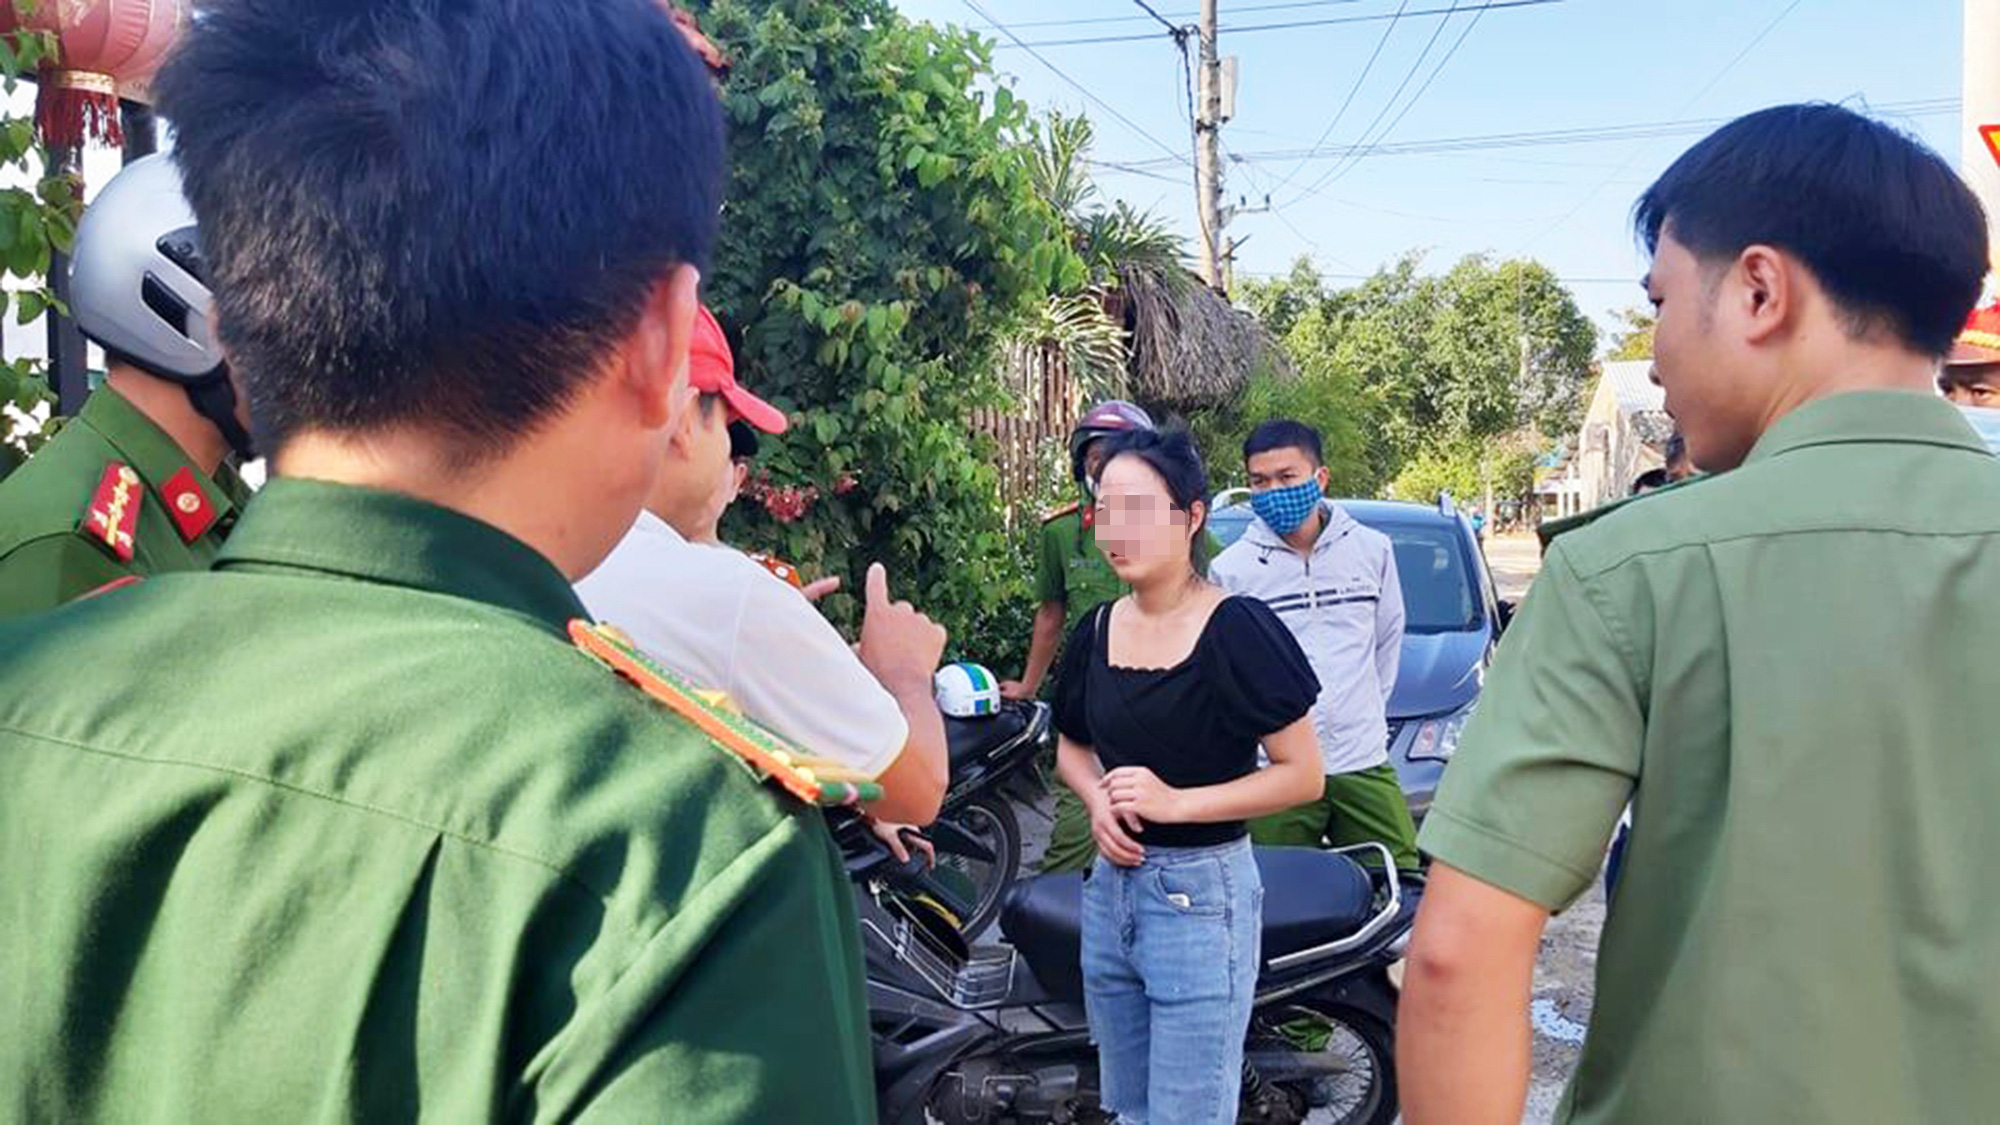 Authorities quarantine 21 Chinese citizens after villa raid in central Vietnam